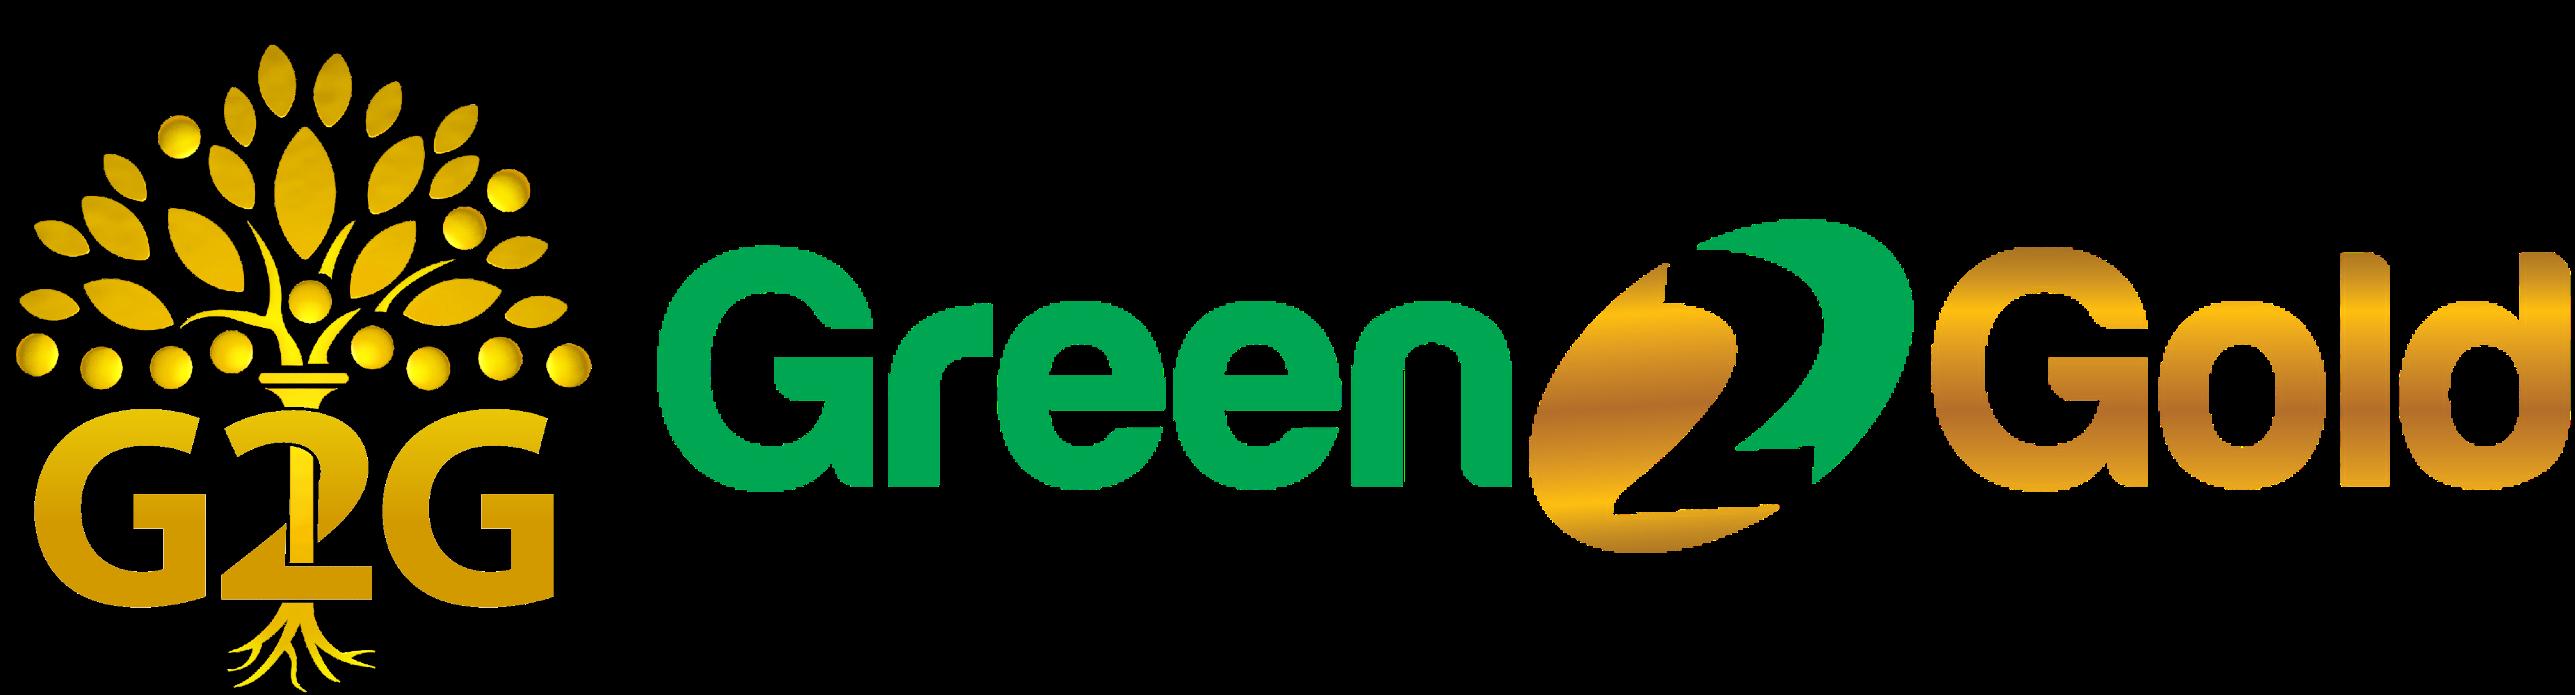 Green2Gold Logo